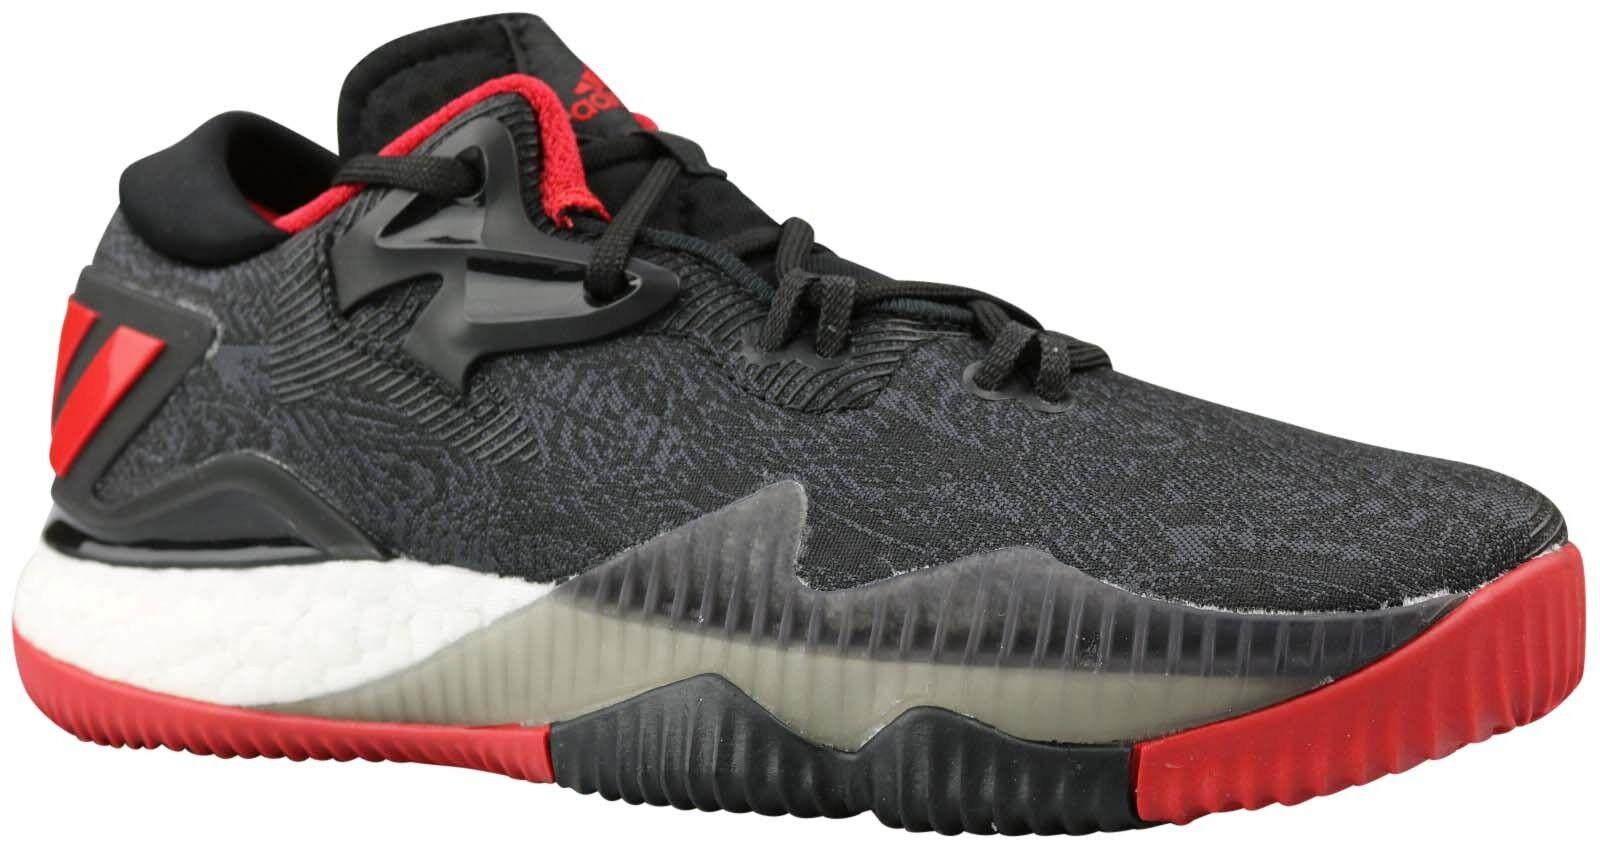 ADIDAS CRAZYLIGHT Boost Low scarpe da ginnastica Scarpe Nero b42603 b42603 b42603 Taglia 35,5 & 37 NUOVO & OVP 5654c3